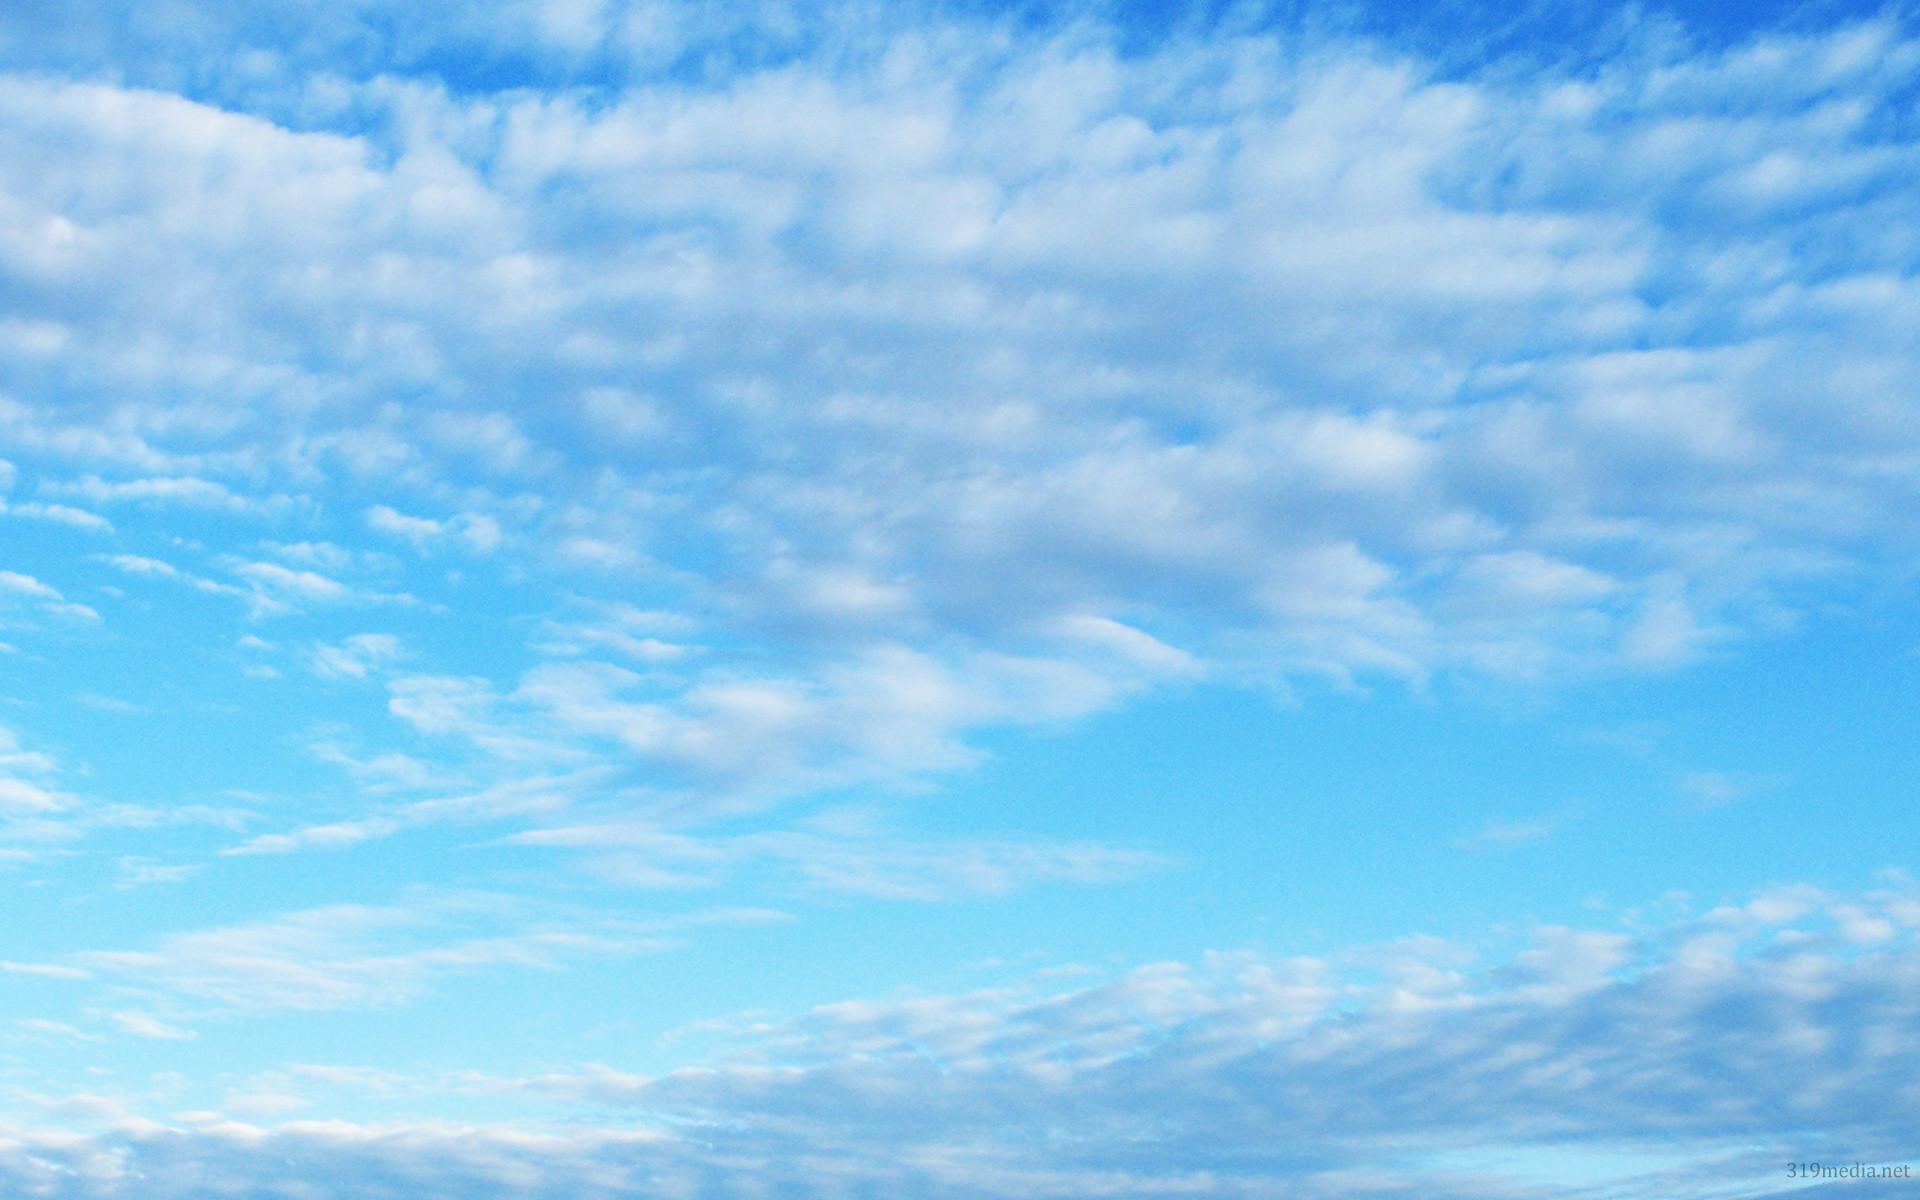 Iphone Wallpaper Cloud Sfondi Cielo 52 Immagini